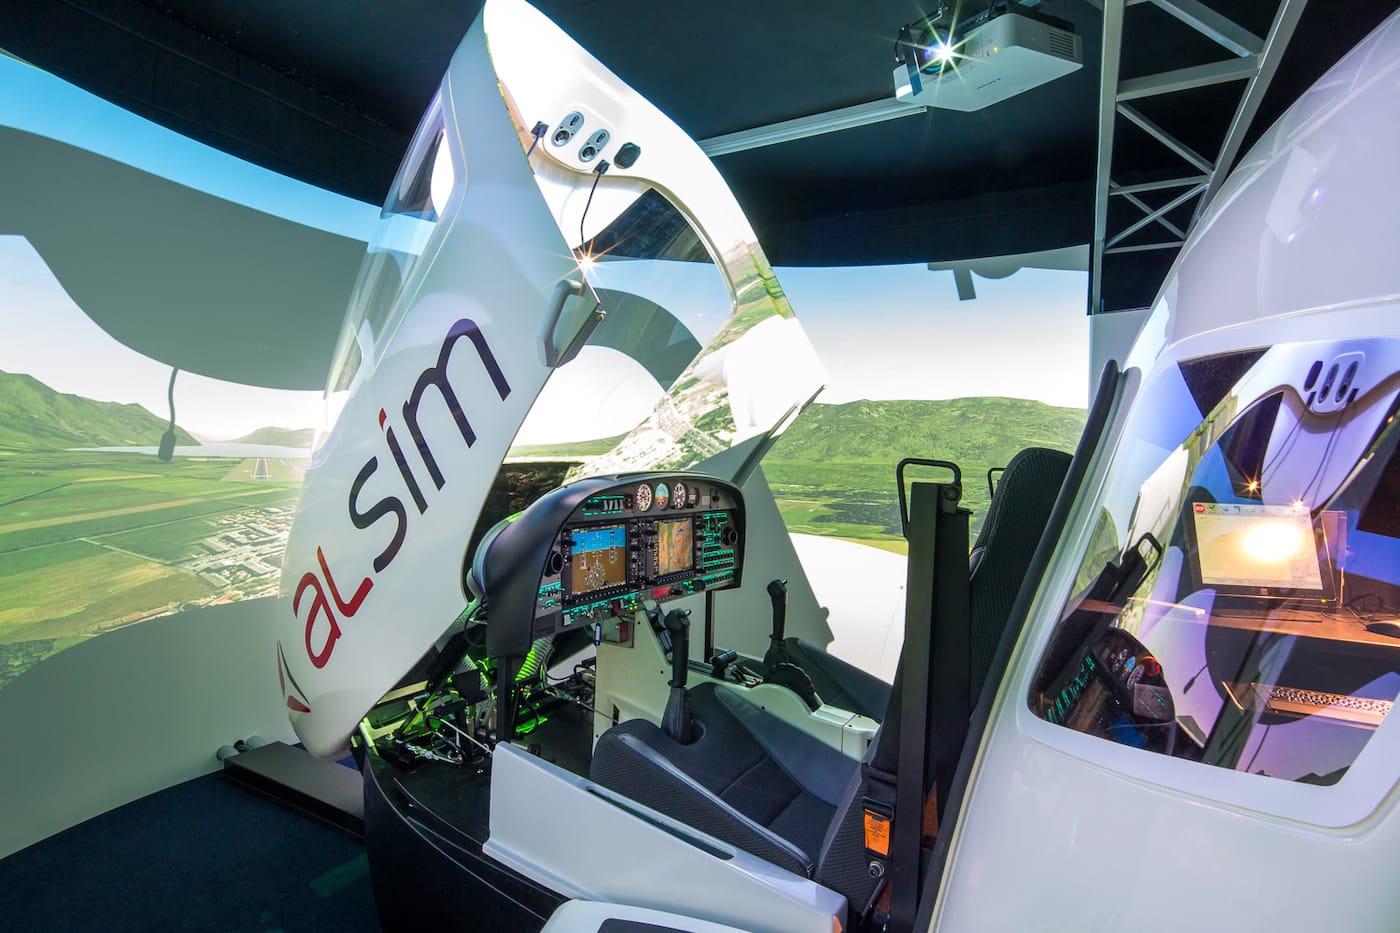 alsim al42 simulators opened glass cockpit